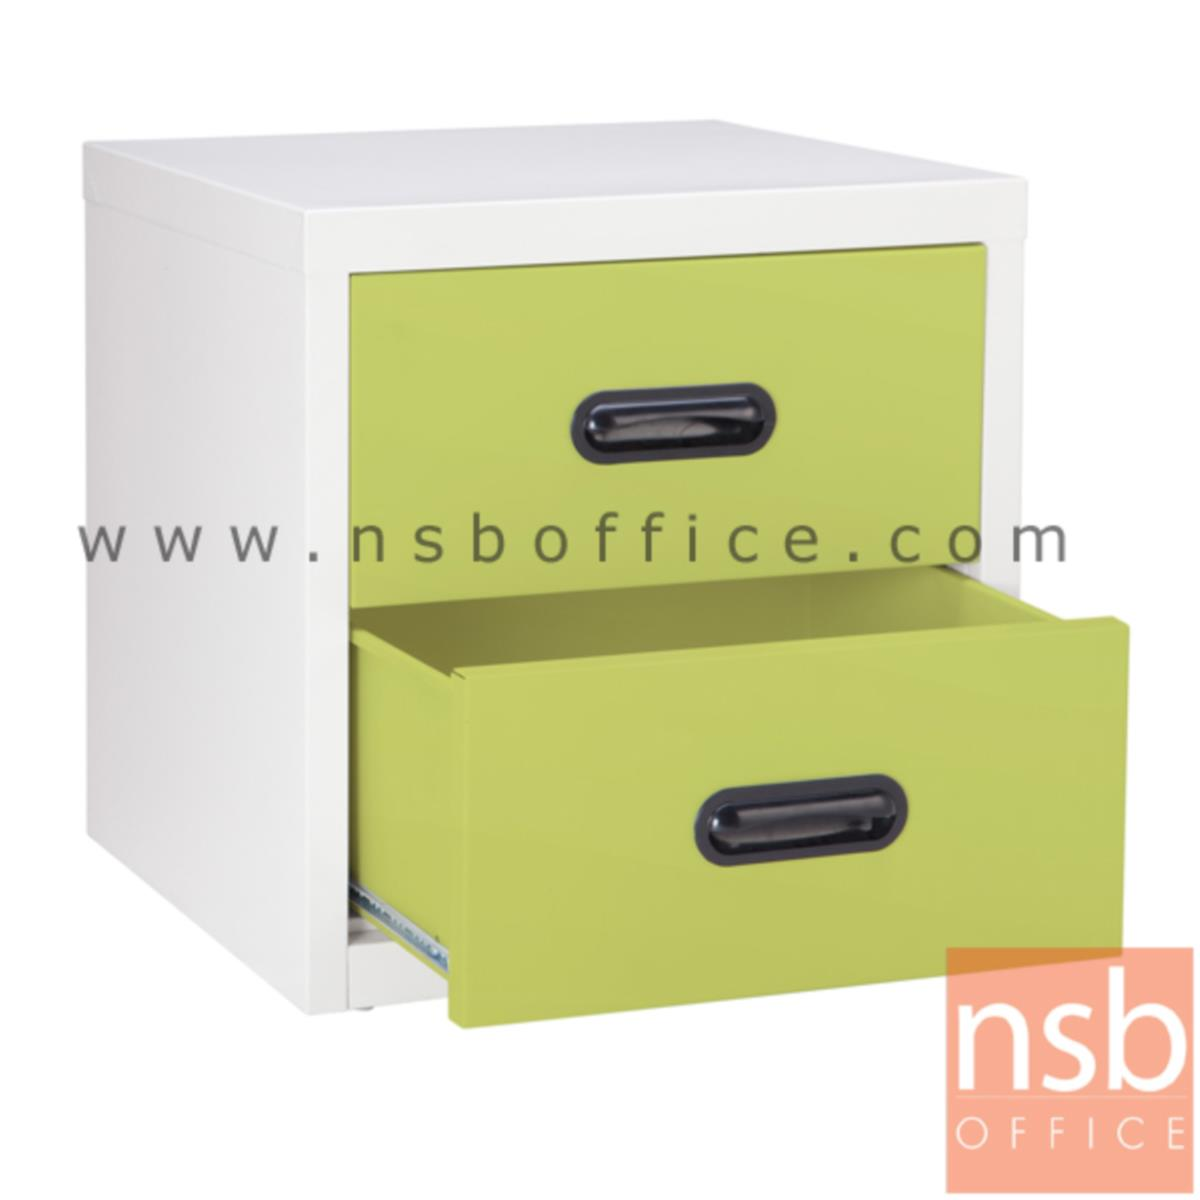 E25A004:ตู้เหล็ก 2 ลิ้นชัก หน้าบานสีสัน 44W*40.7D*44H cm รุ่น UNI-4